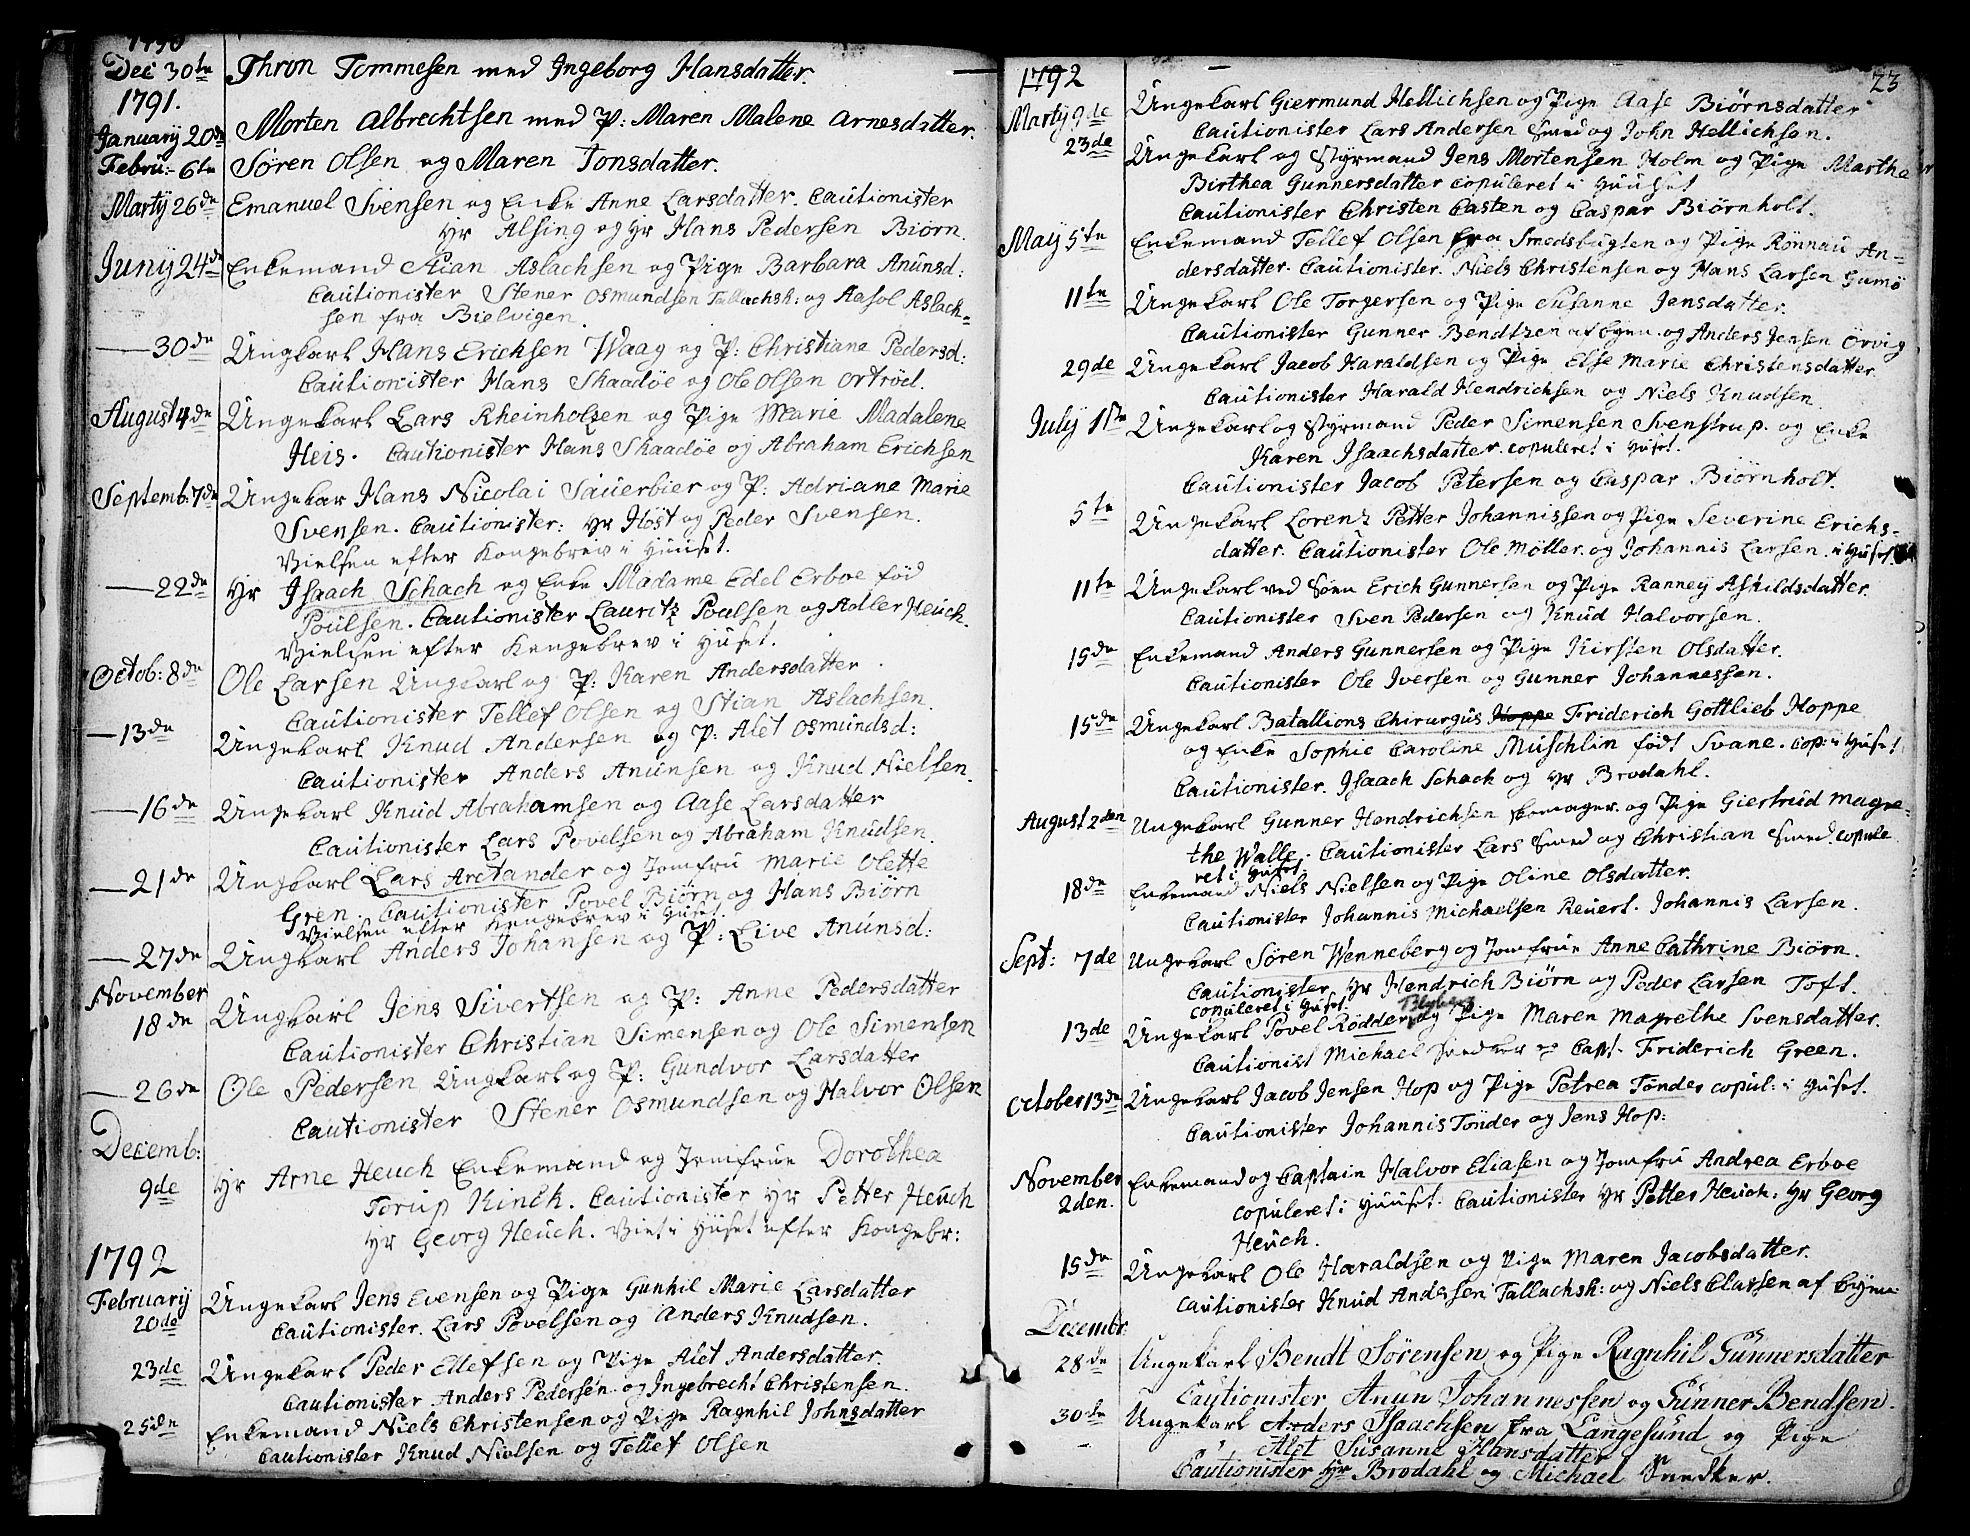 SAKO, Kragerø kirkebøker, F/Fa/L0002: Ministerialbok nr. 2, 1767-1802, s. 23